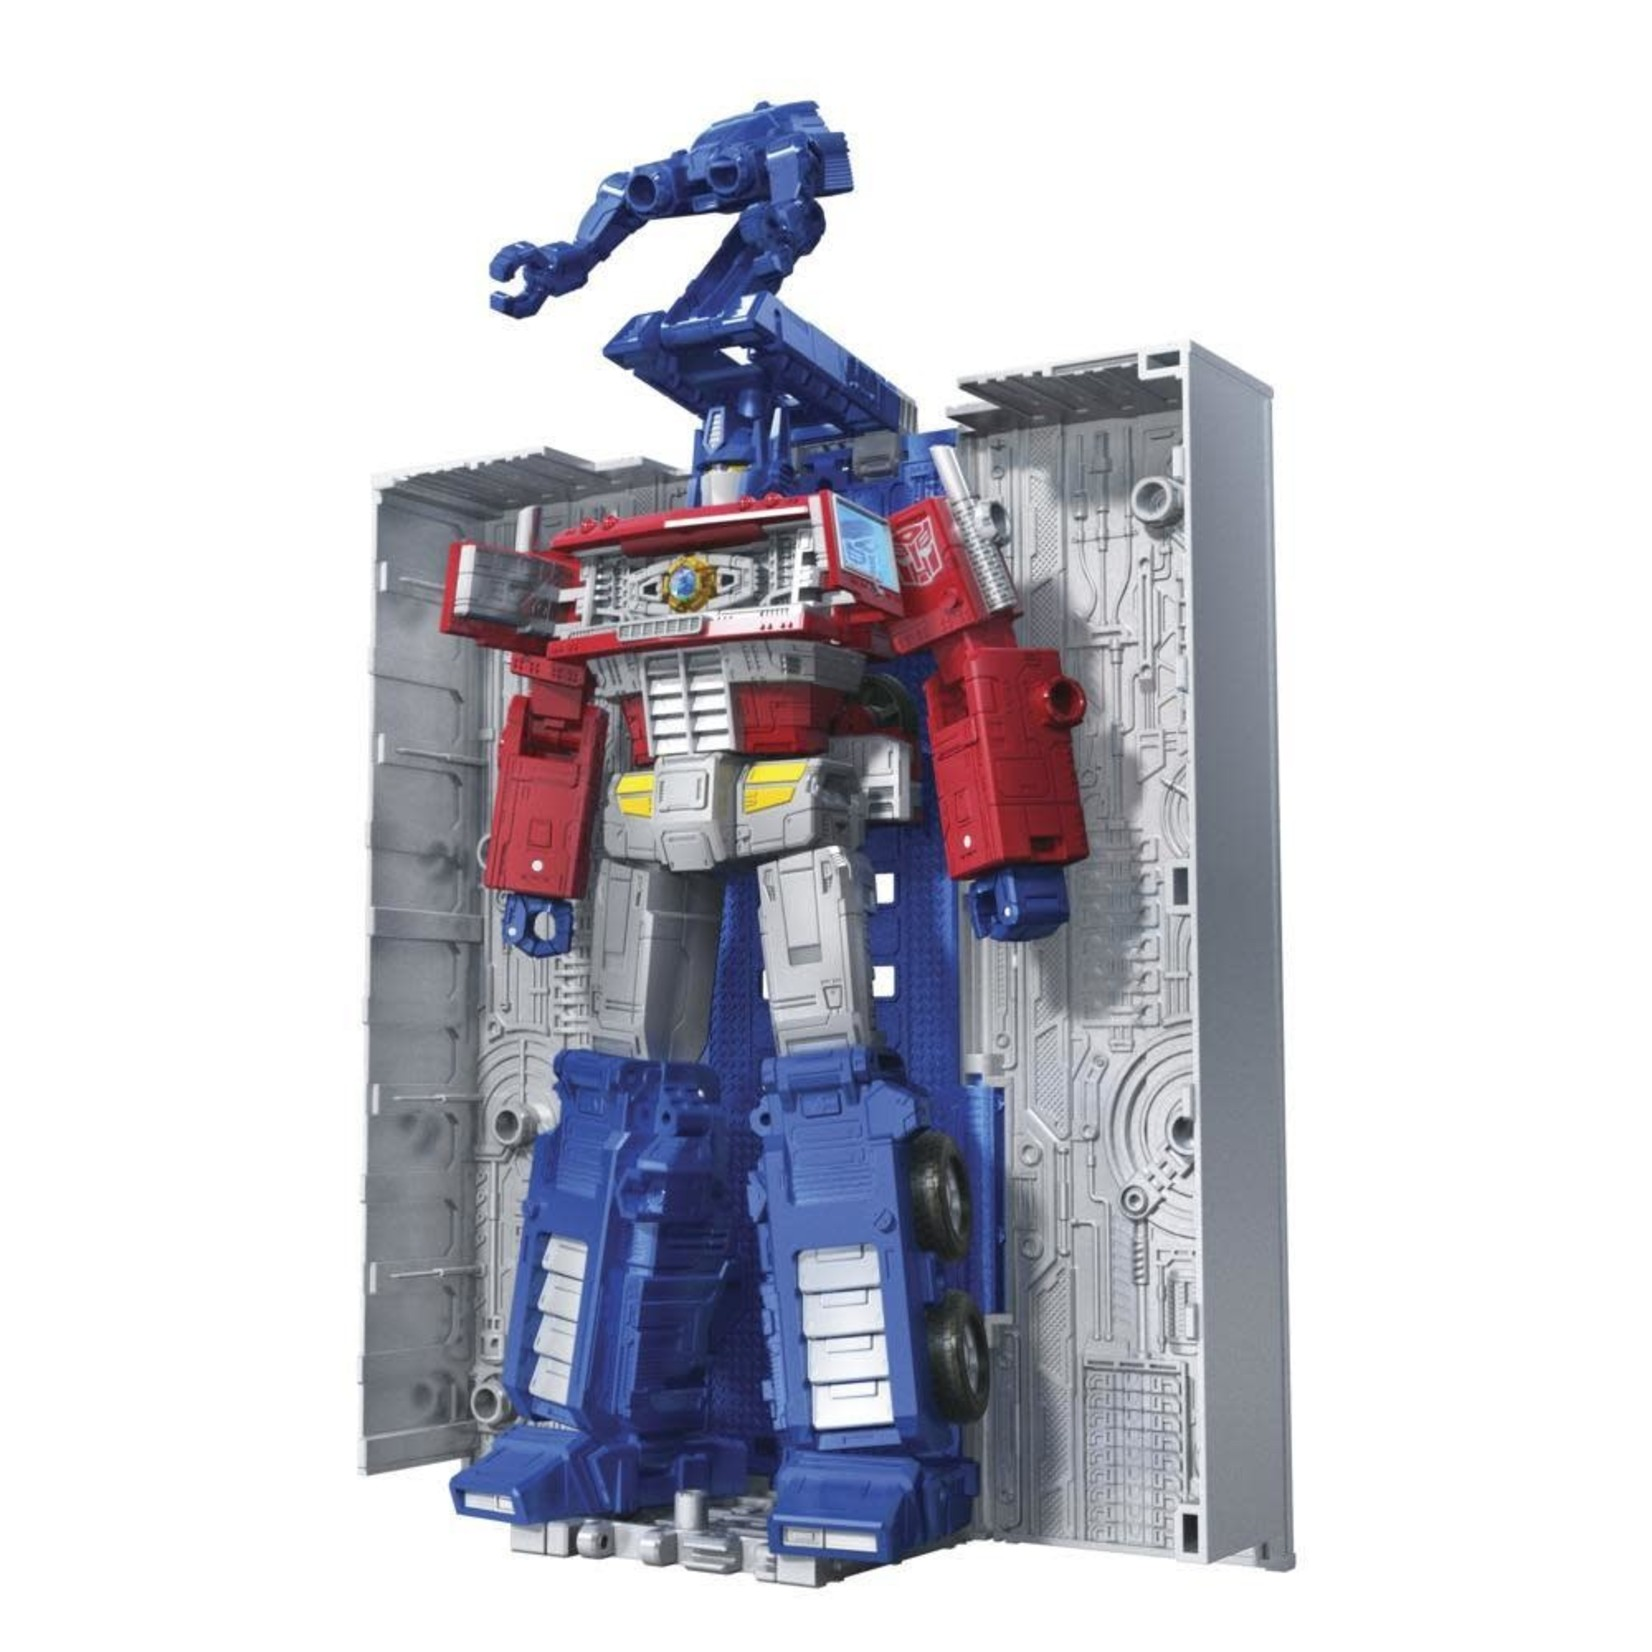 Hasbro Transformers Toys Generations War for Cybertron: Kingdom Leader WFC-K11 Optimus Prime